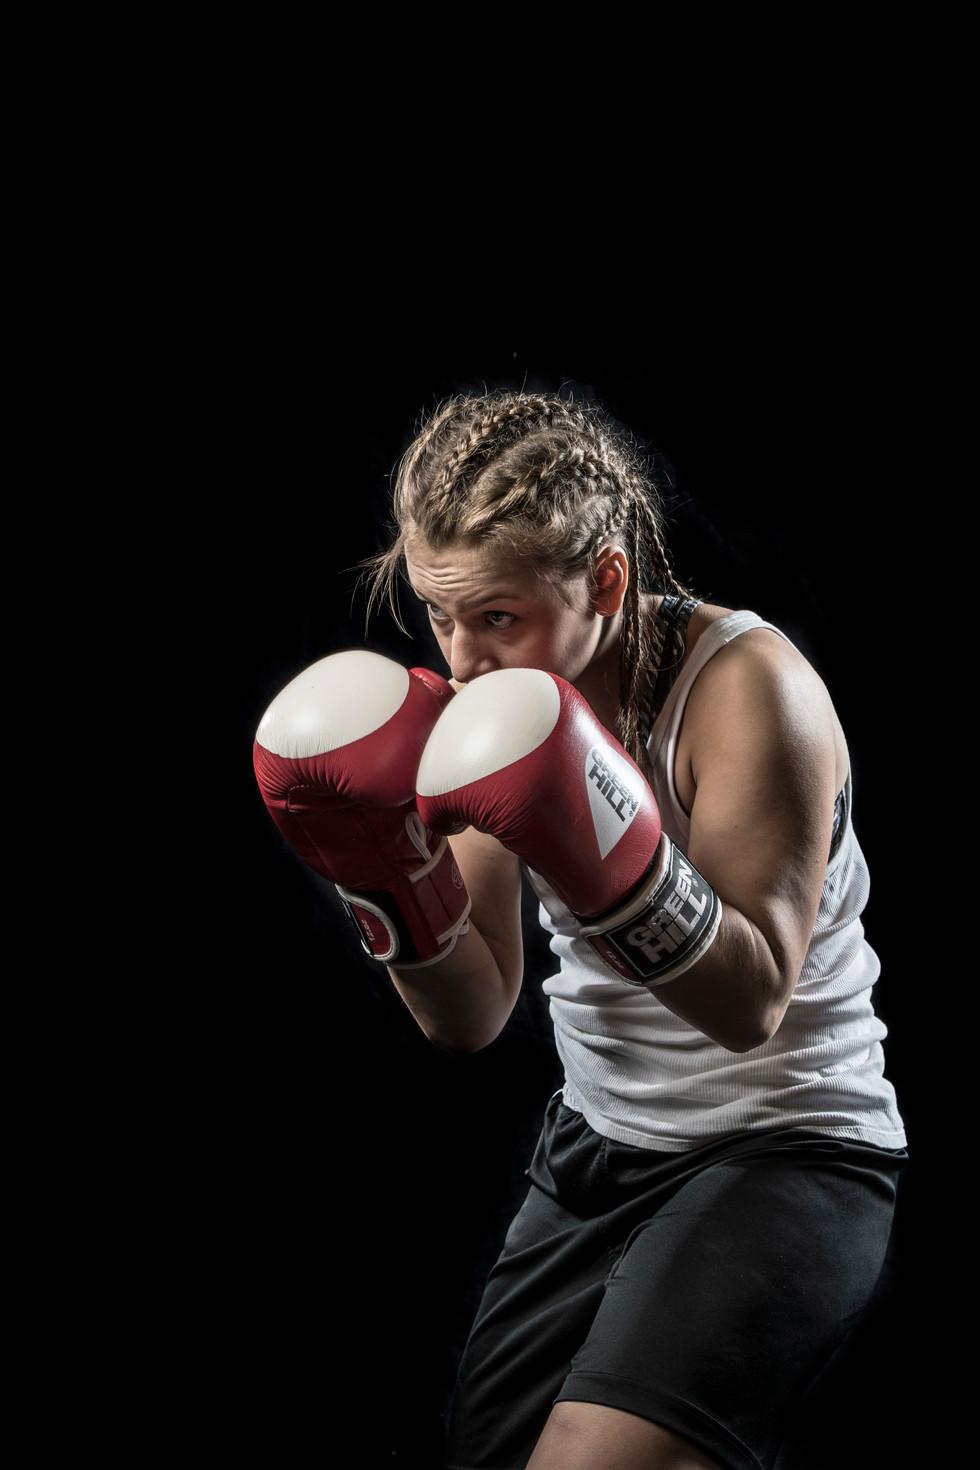 Sportfotografie-Boxen-Boxerin-15.jpg